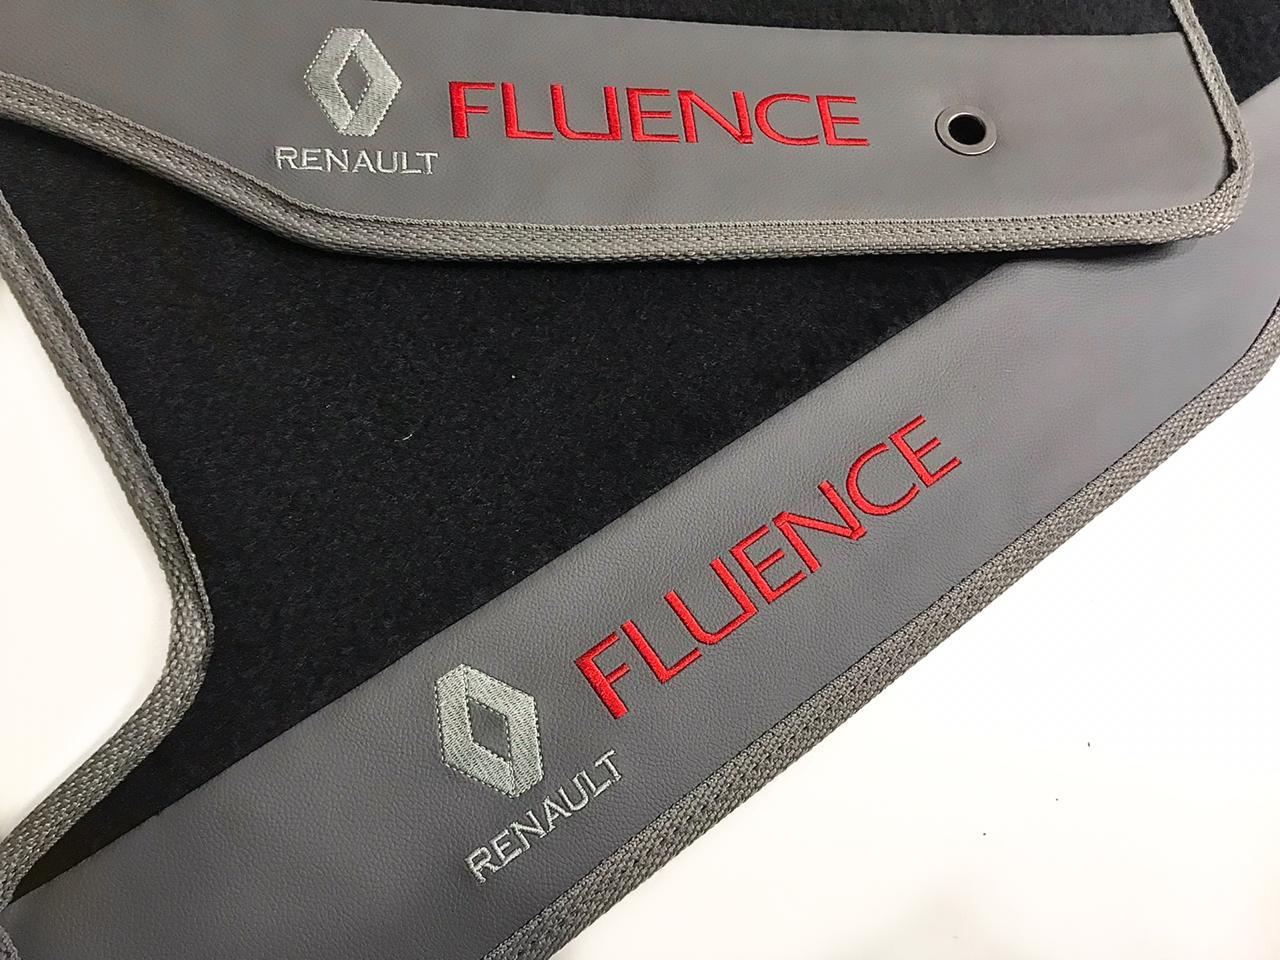 Tapete Carpete Renault Fluence Luxo Borracha Base Pinada